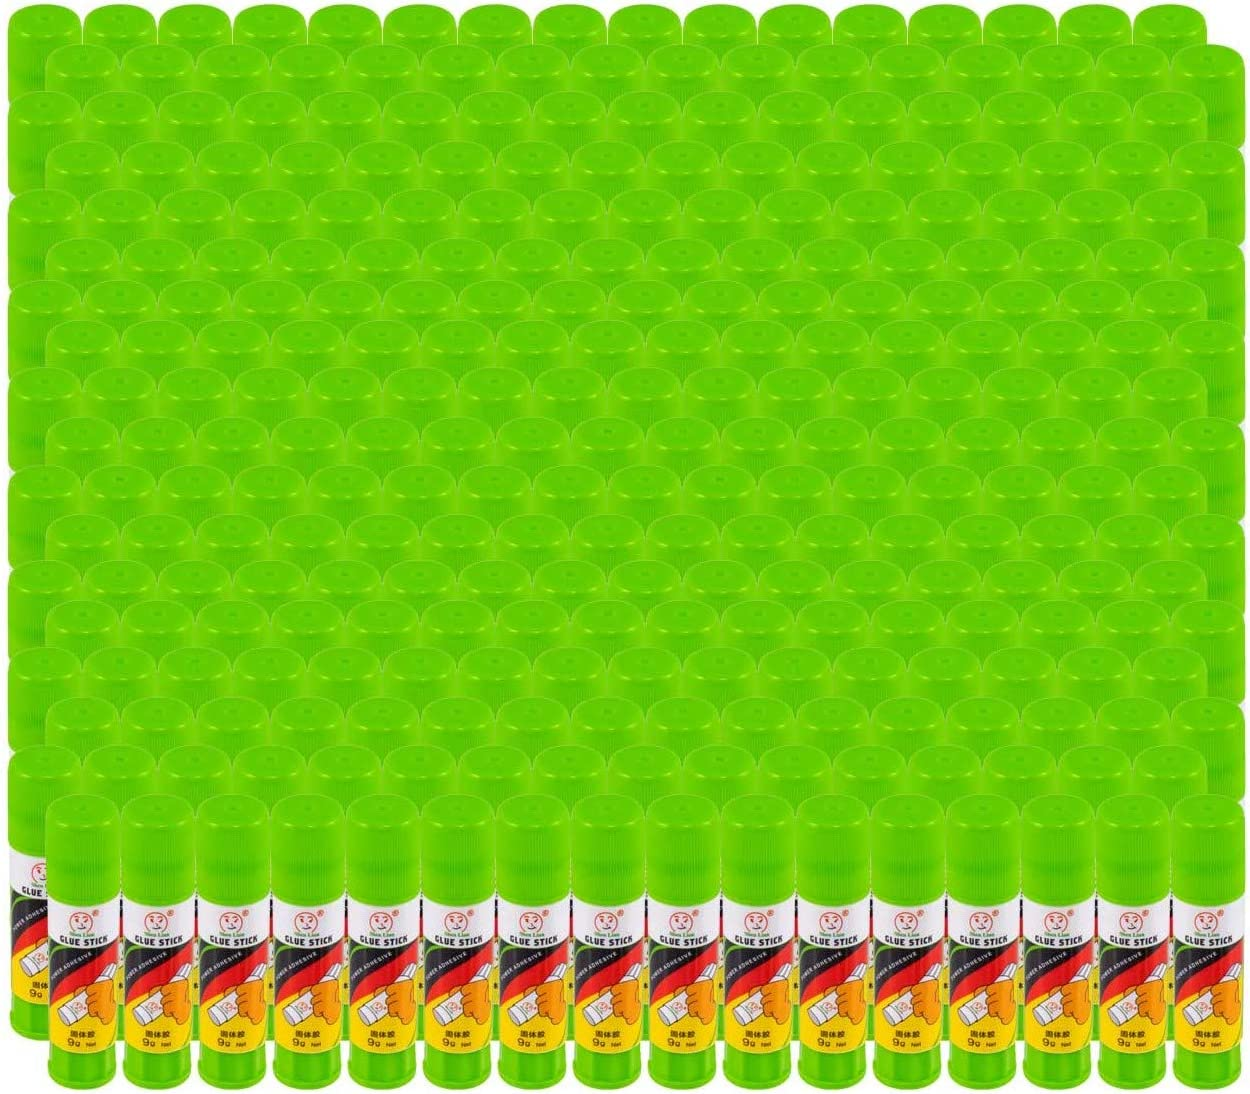 288 Count Bulk Glue Sticks All Purpose, Washable .30 OZ Sticks - Case of Wholesale School Supplies